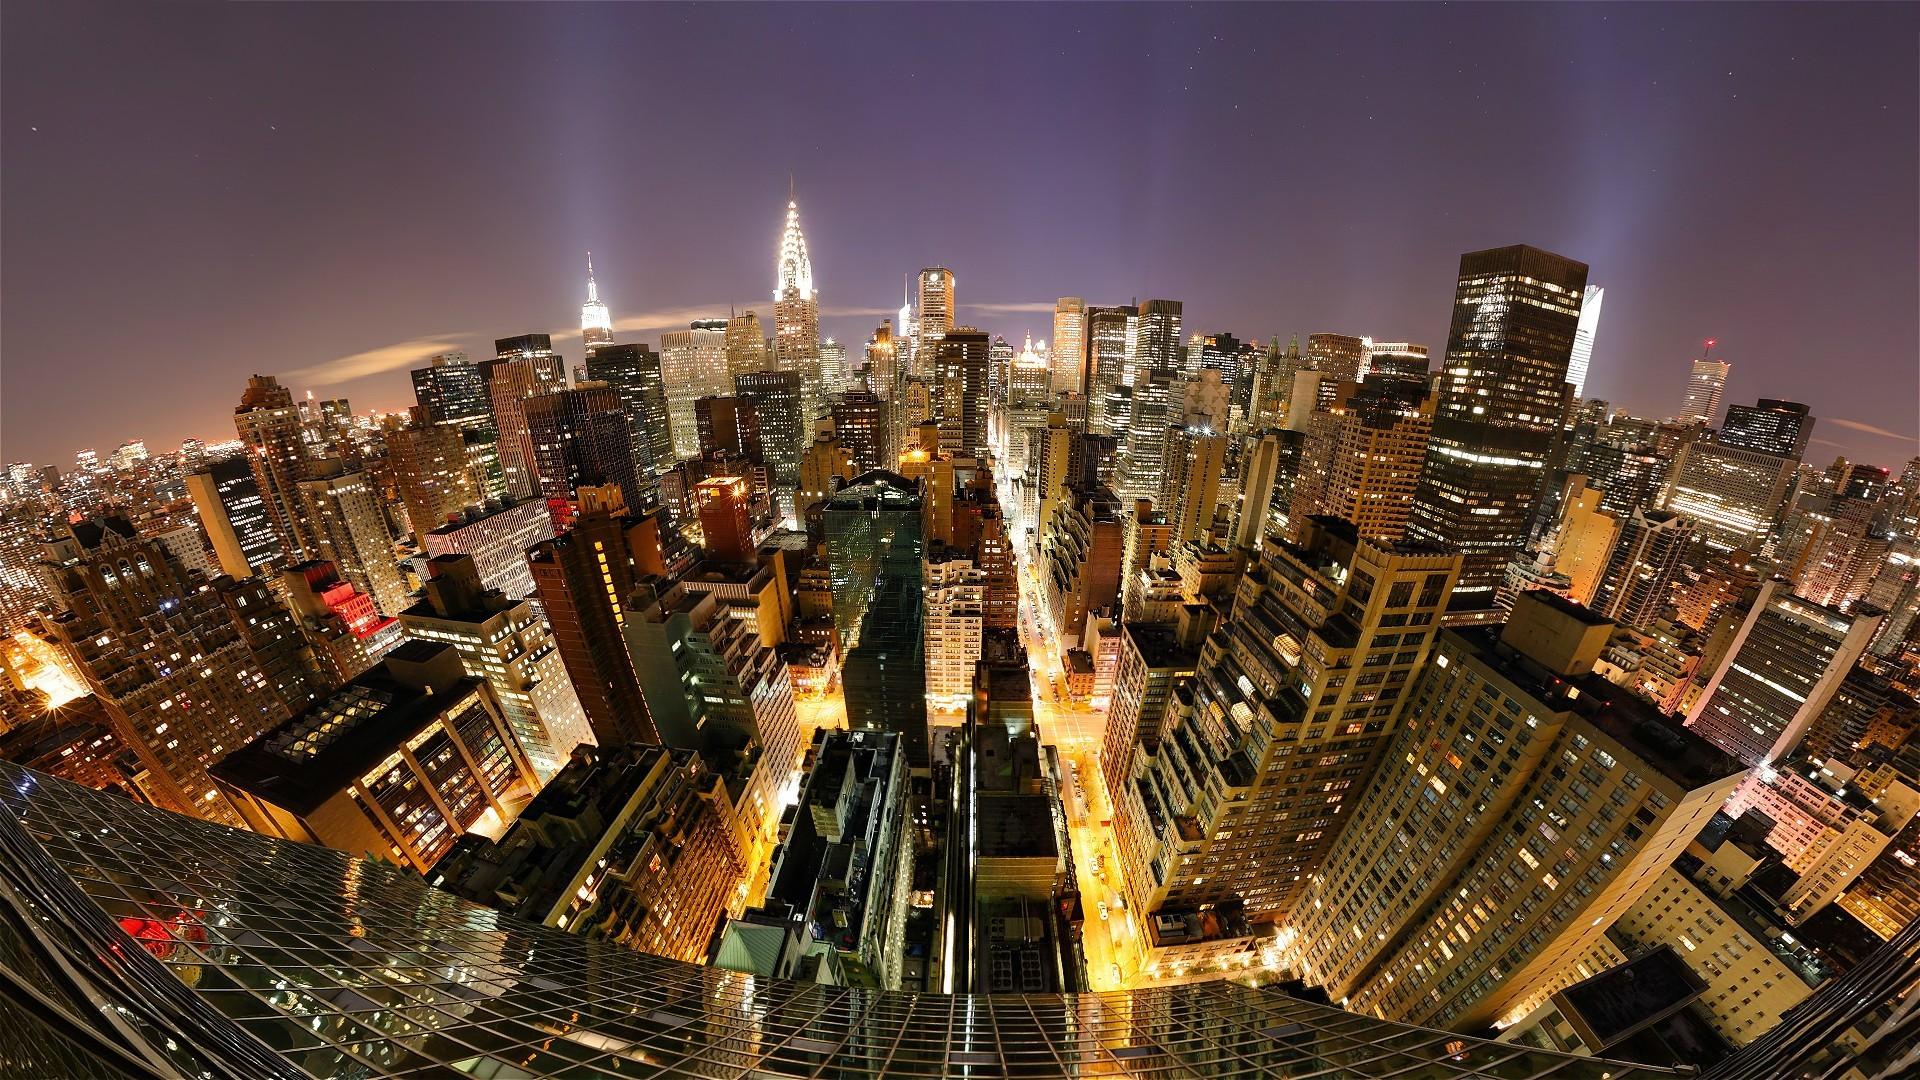 New York City At Night Background Wallpaper